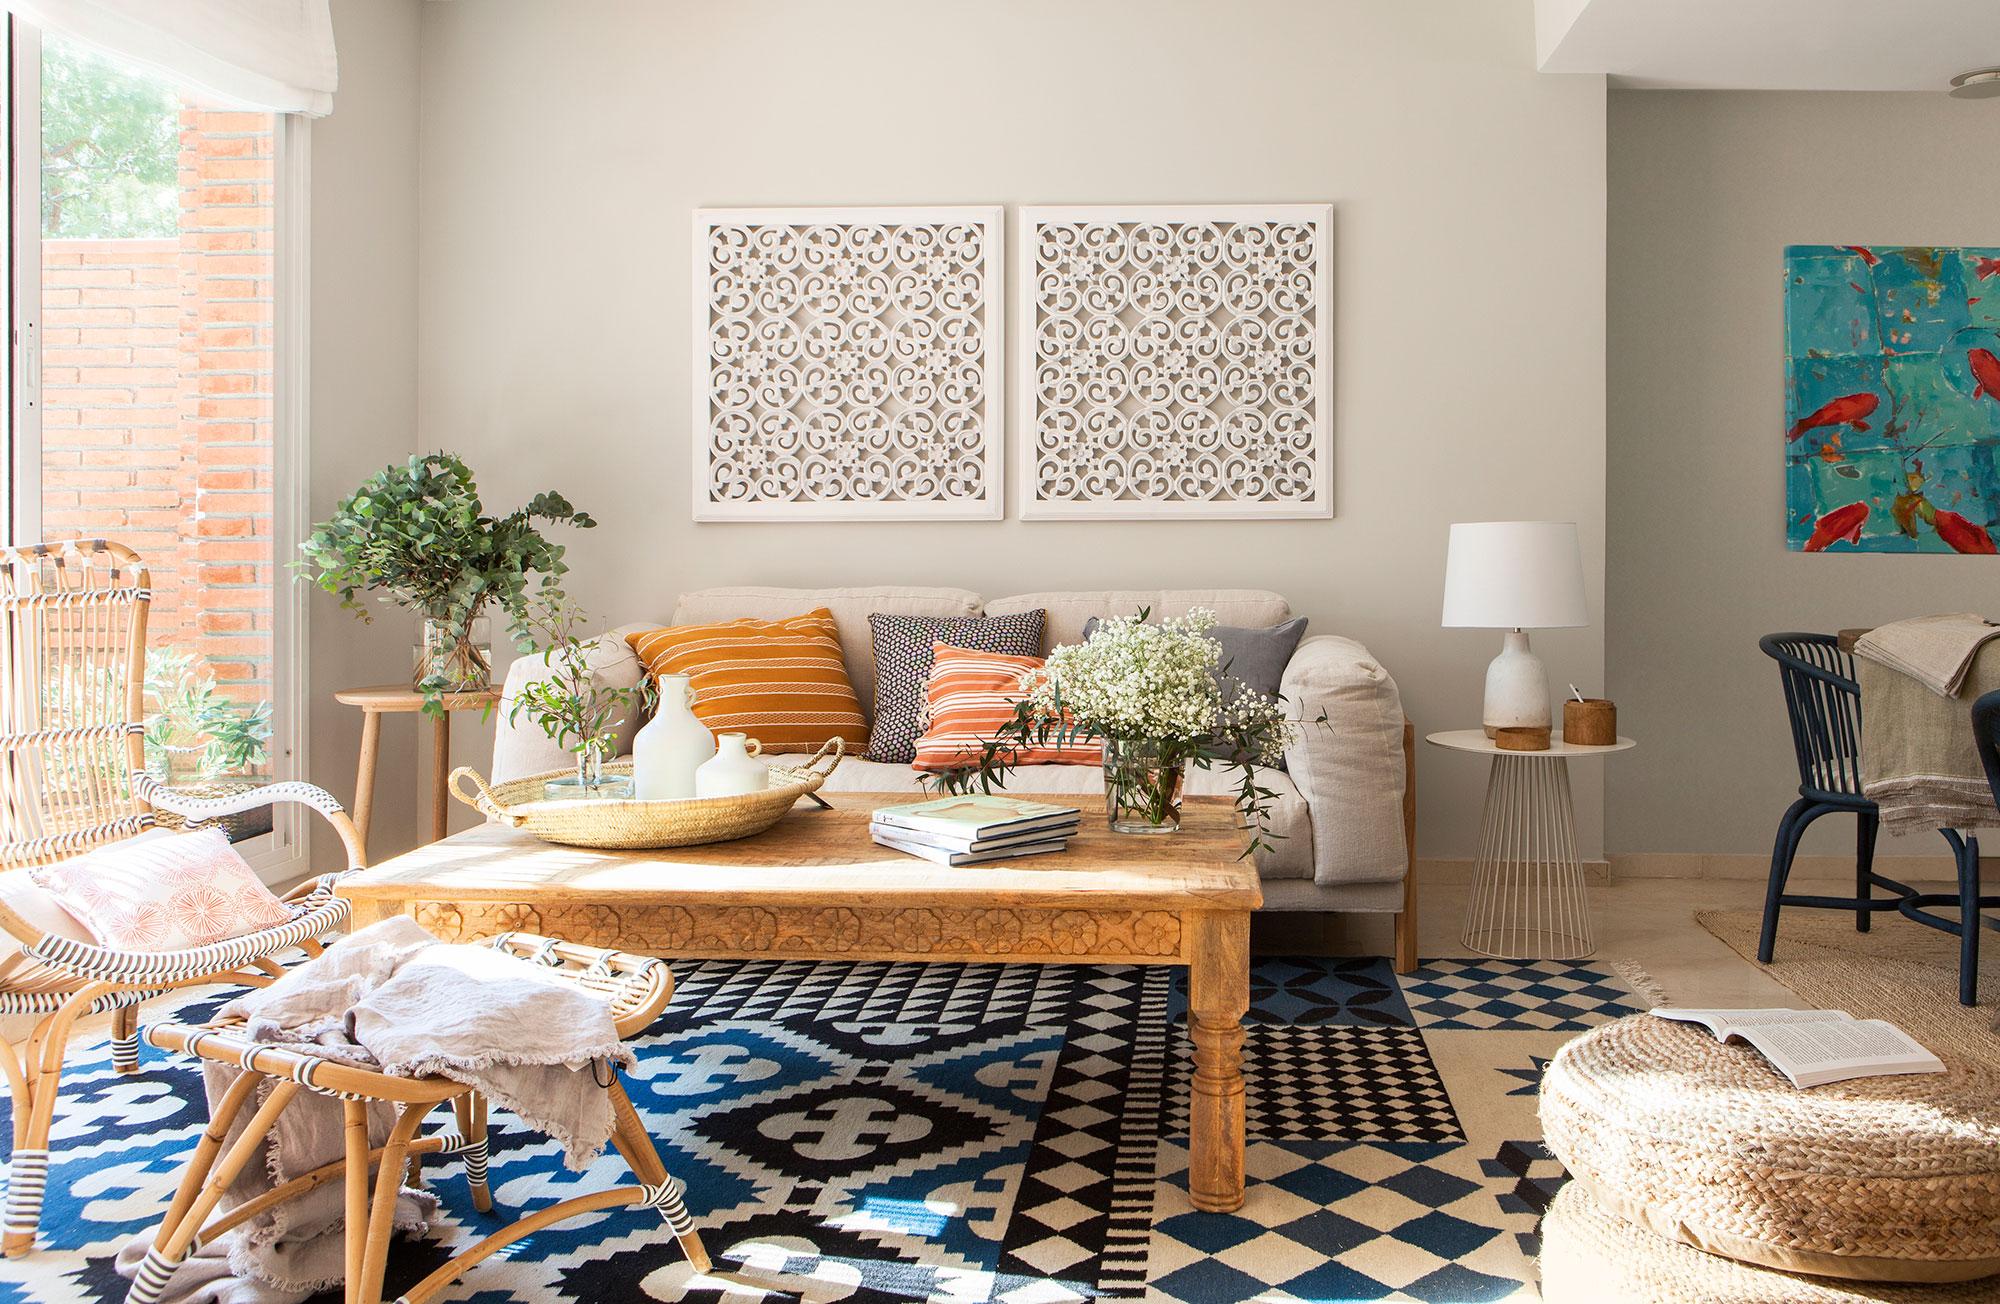 Hermoso alfombra comedor galer a de im genes inspiracion - Casa de alfombras ...